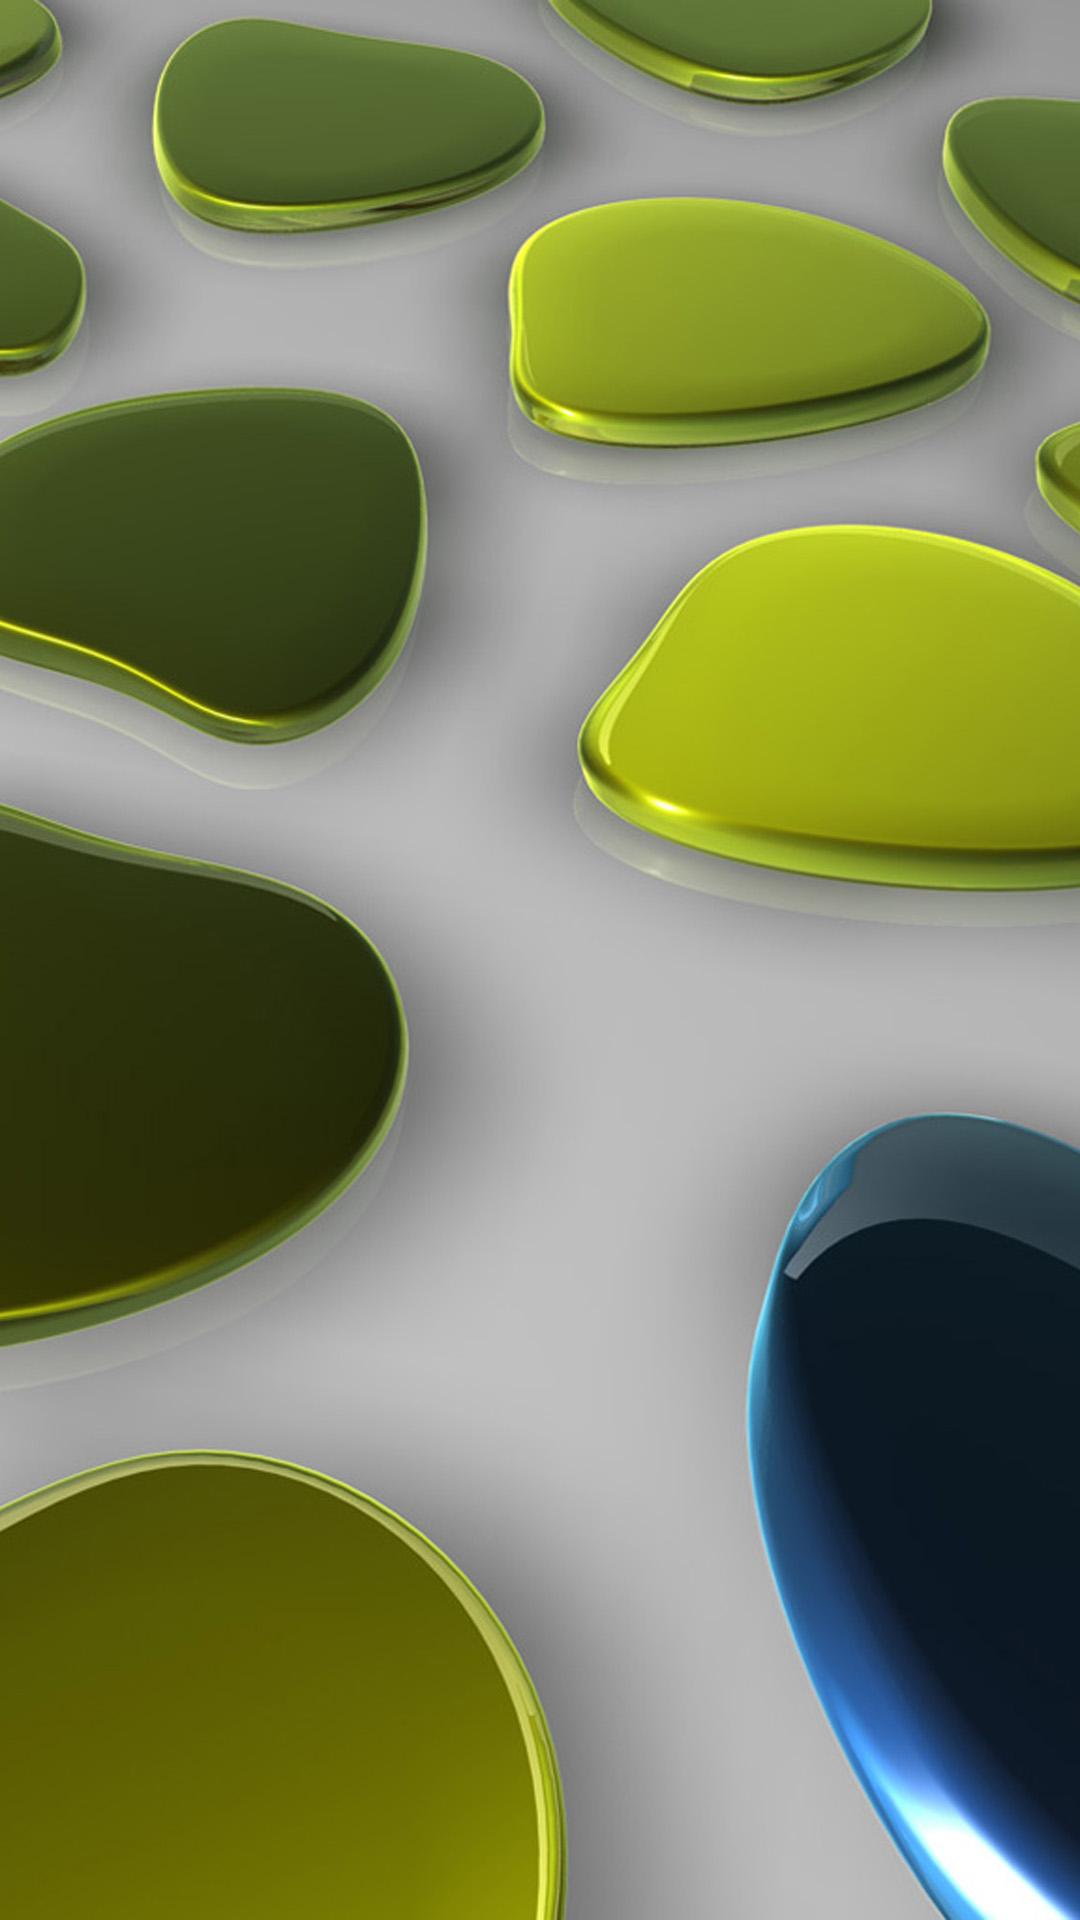 new wallpapers hd Samsung Galaxy S5 Wallpapers Samsung Galaxy S5 1080x1920